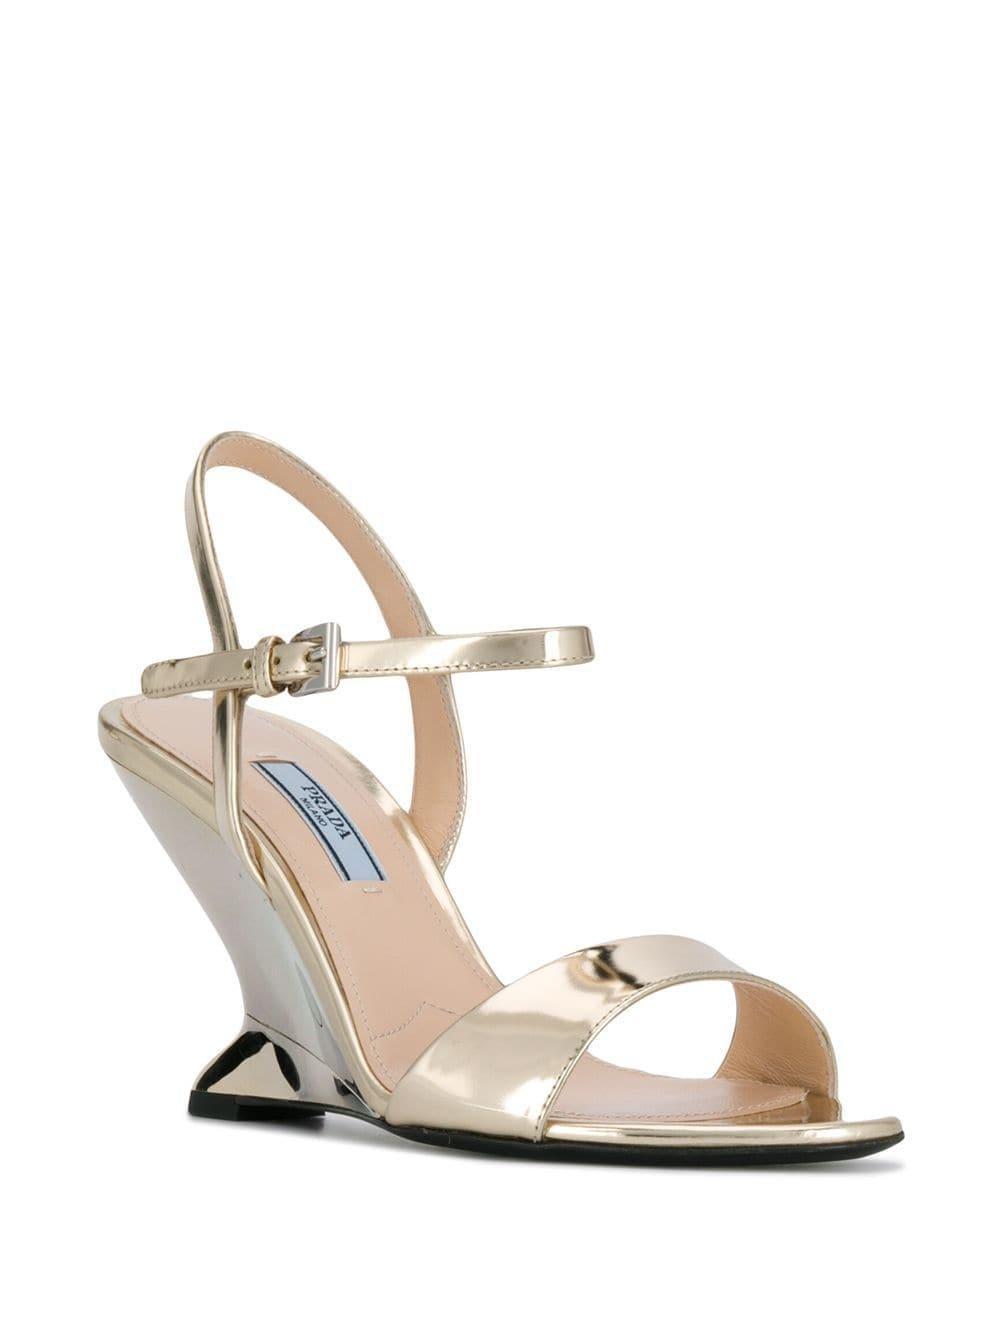 af763ad2ca7 Lyst - Prada Wedge Sandals in Metallic